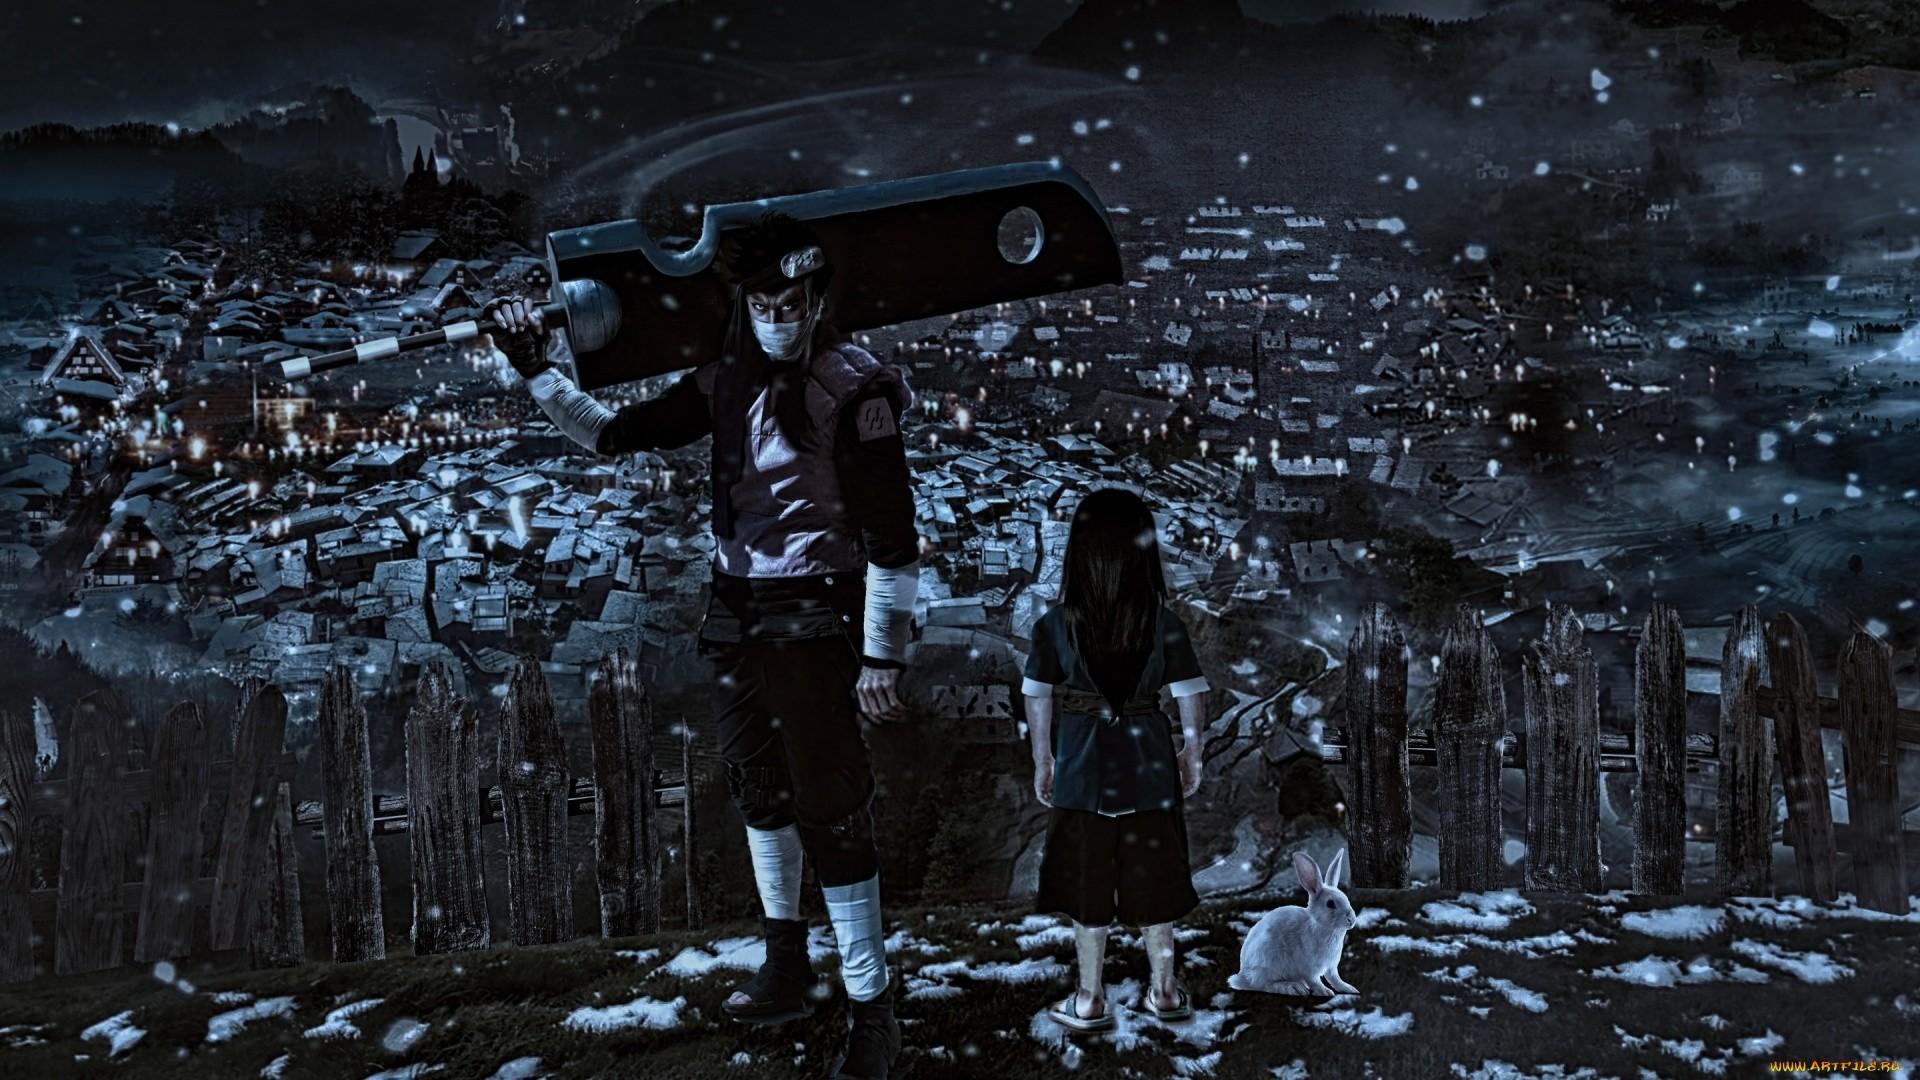 Zabuza download wallpaper image